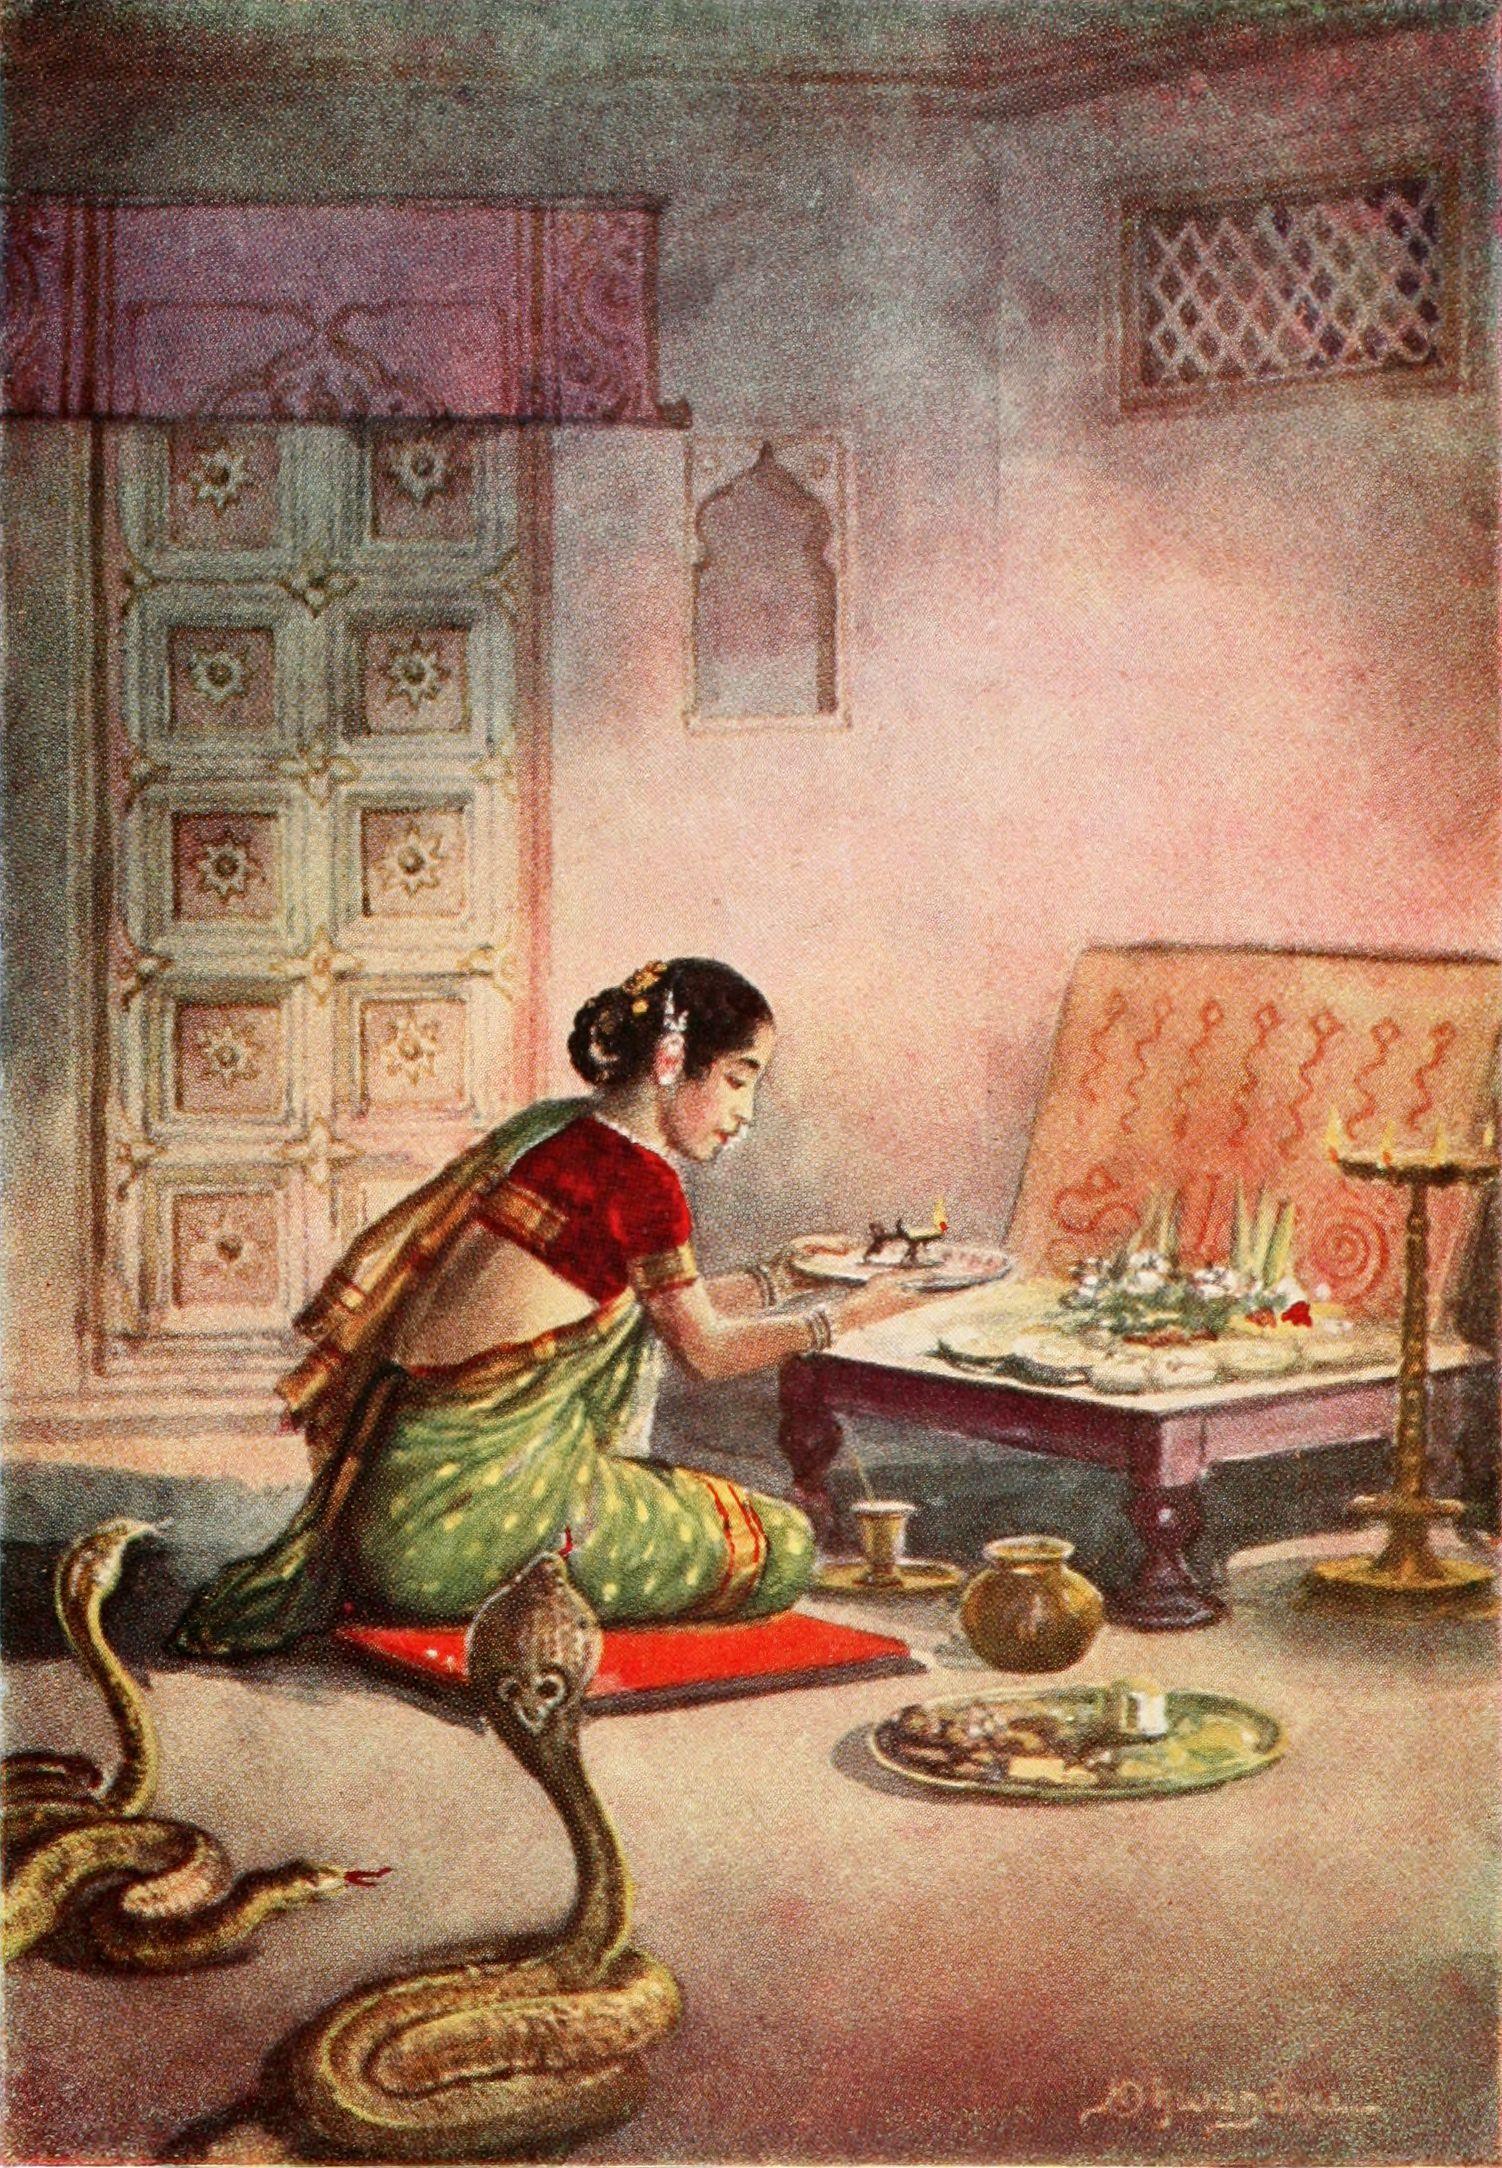 Deccan_Nursery_Tales_097 (1)